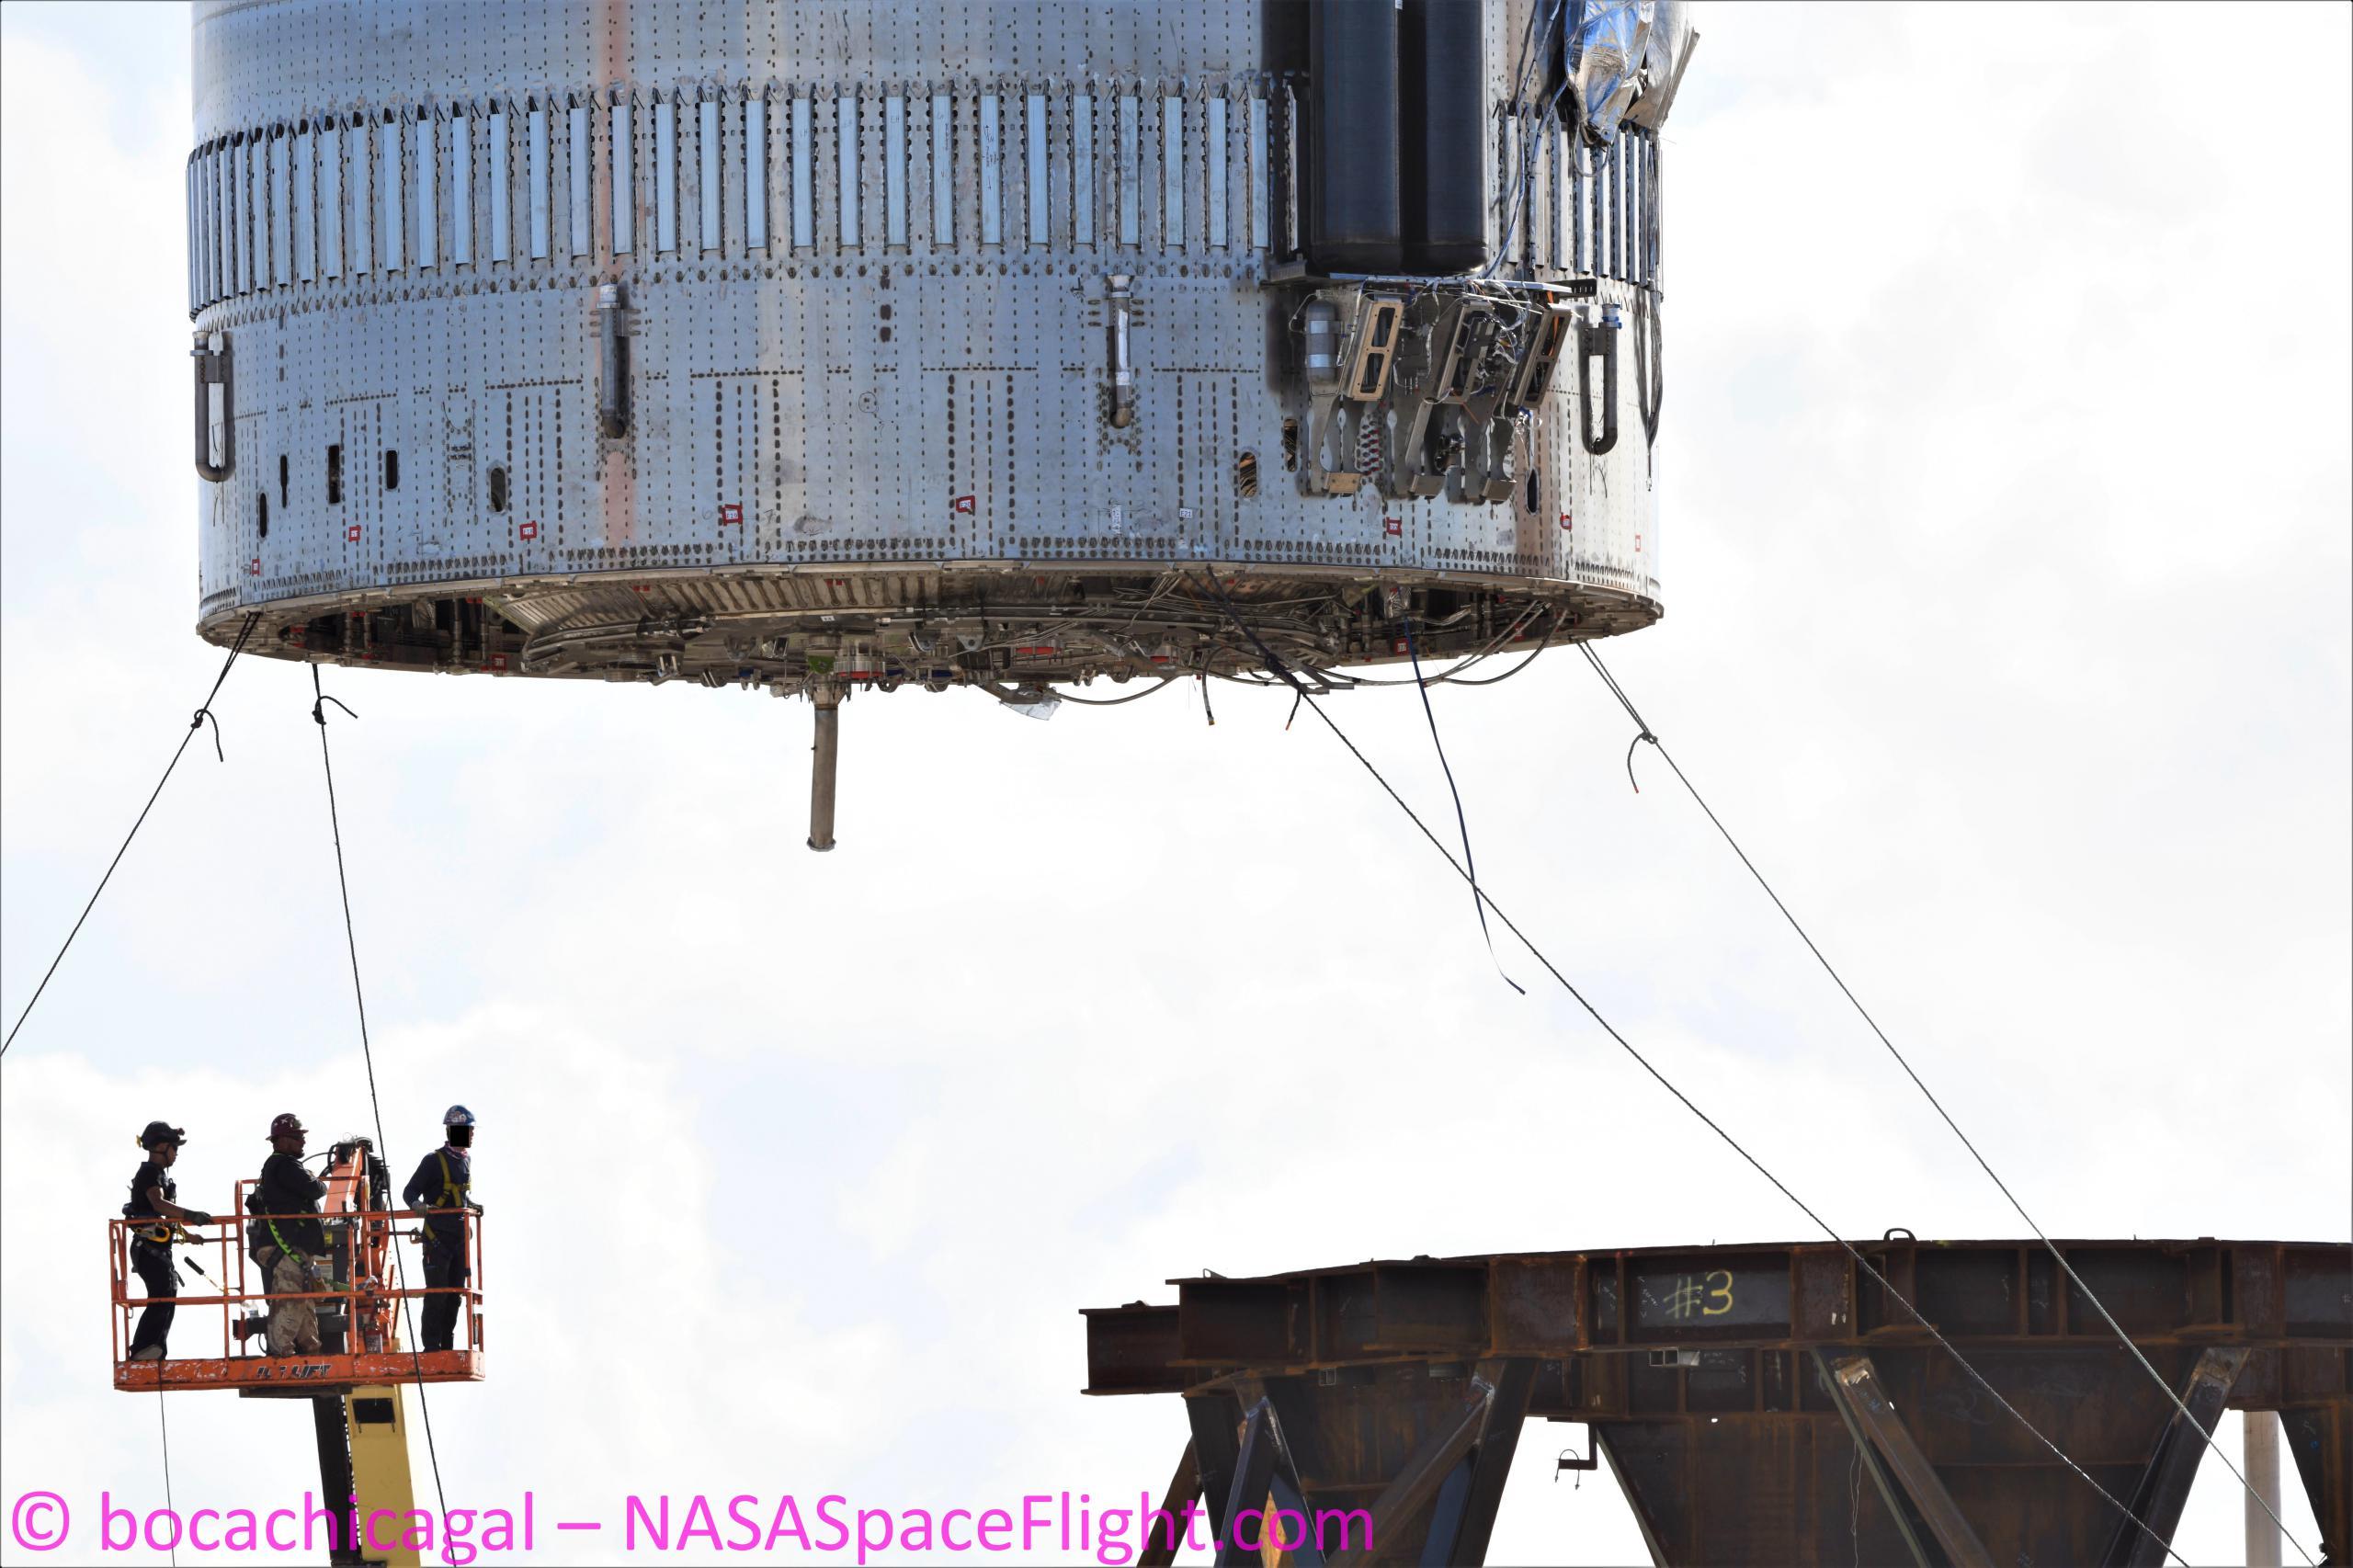 Starship Boca Chica 070121 (NASASpaceflight – bocachicagal) Booster 3 B3 pad install aft view 1 edit (c)